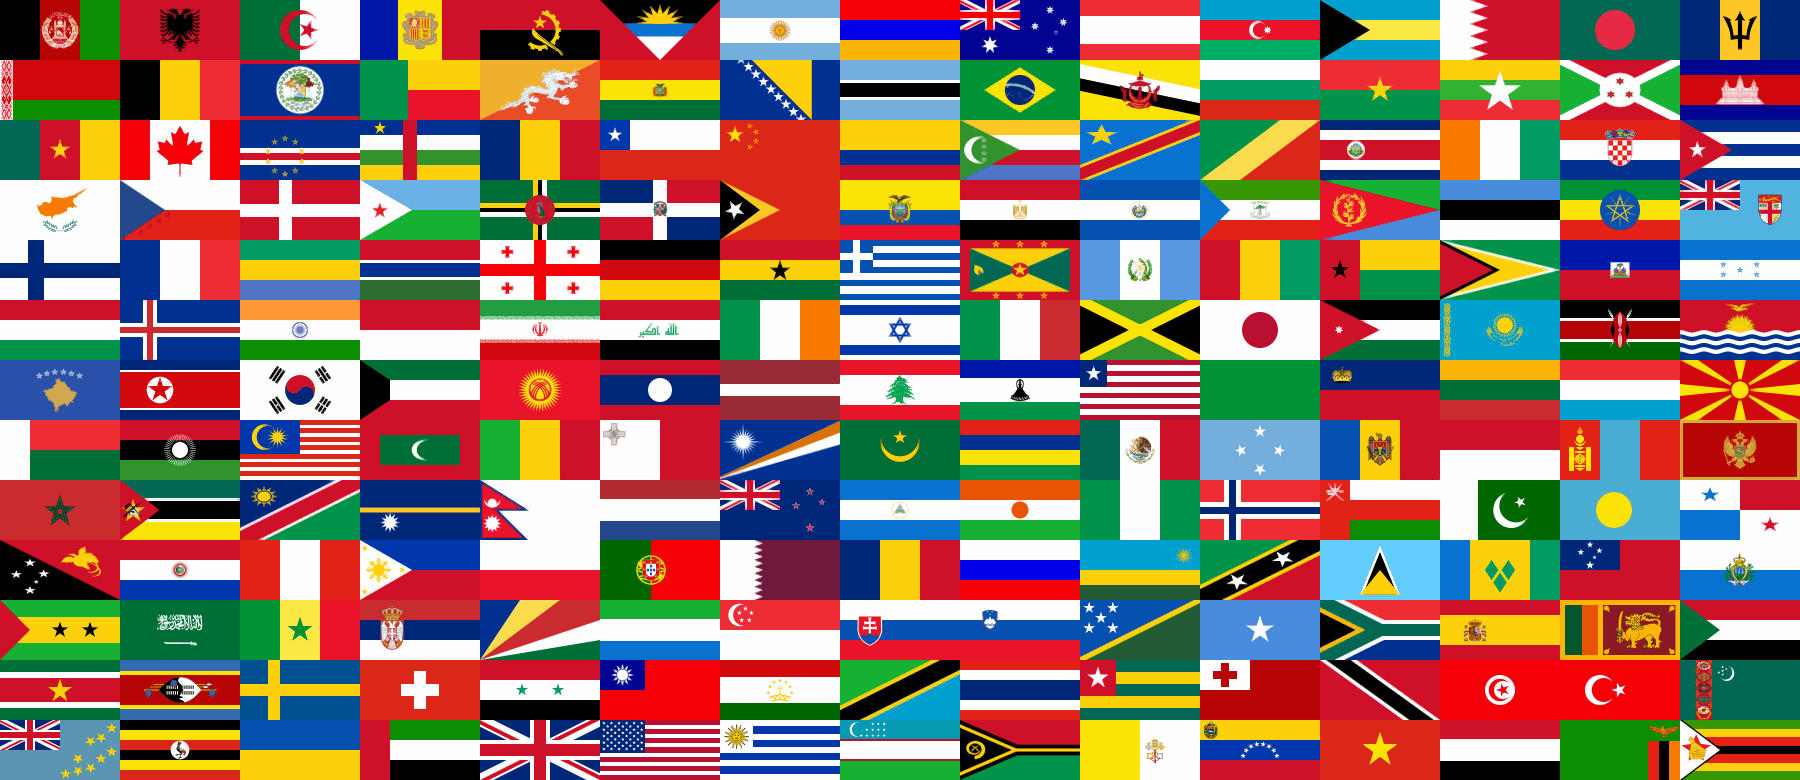 3 Link Building Tips for Foreign Language Websites